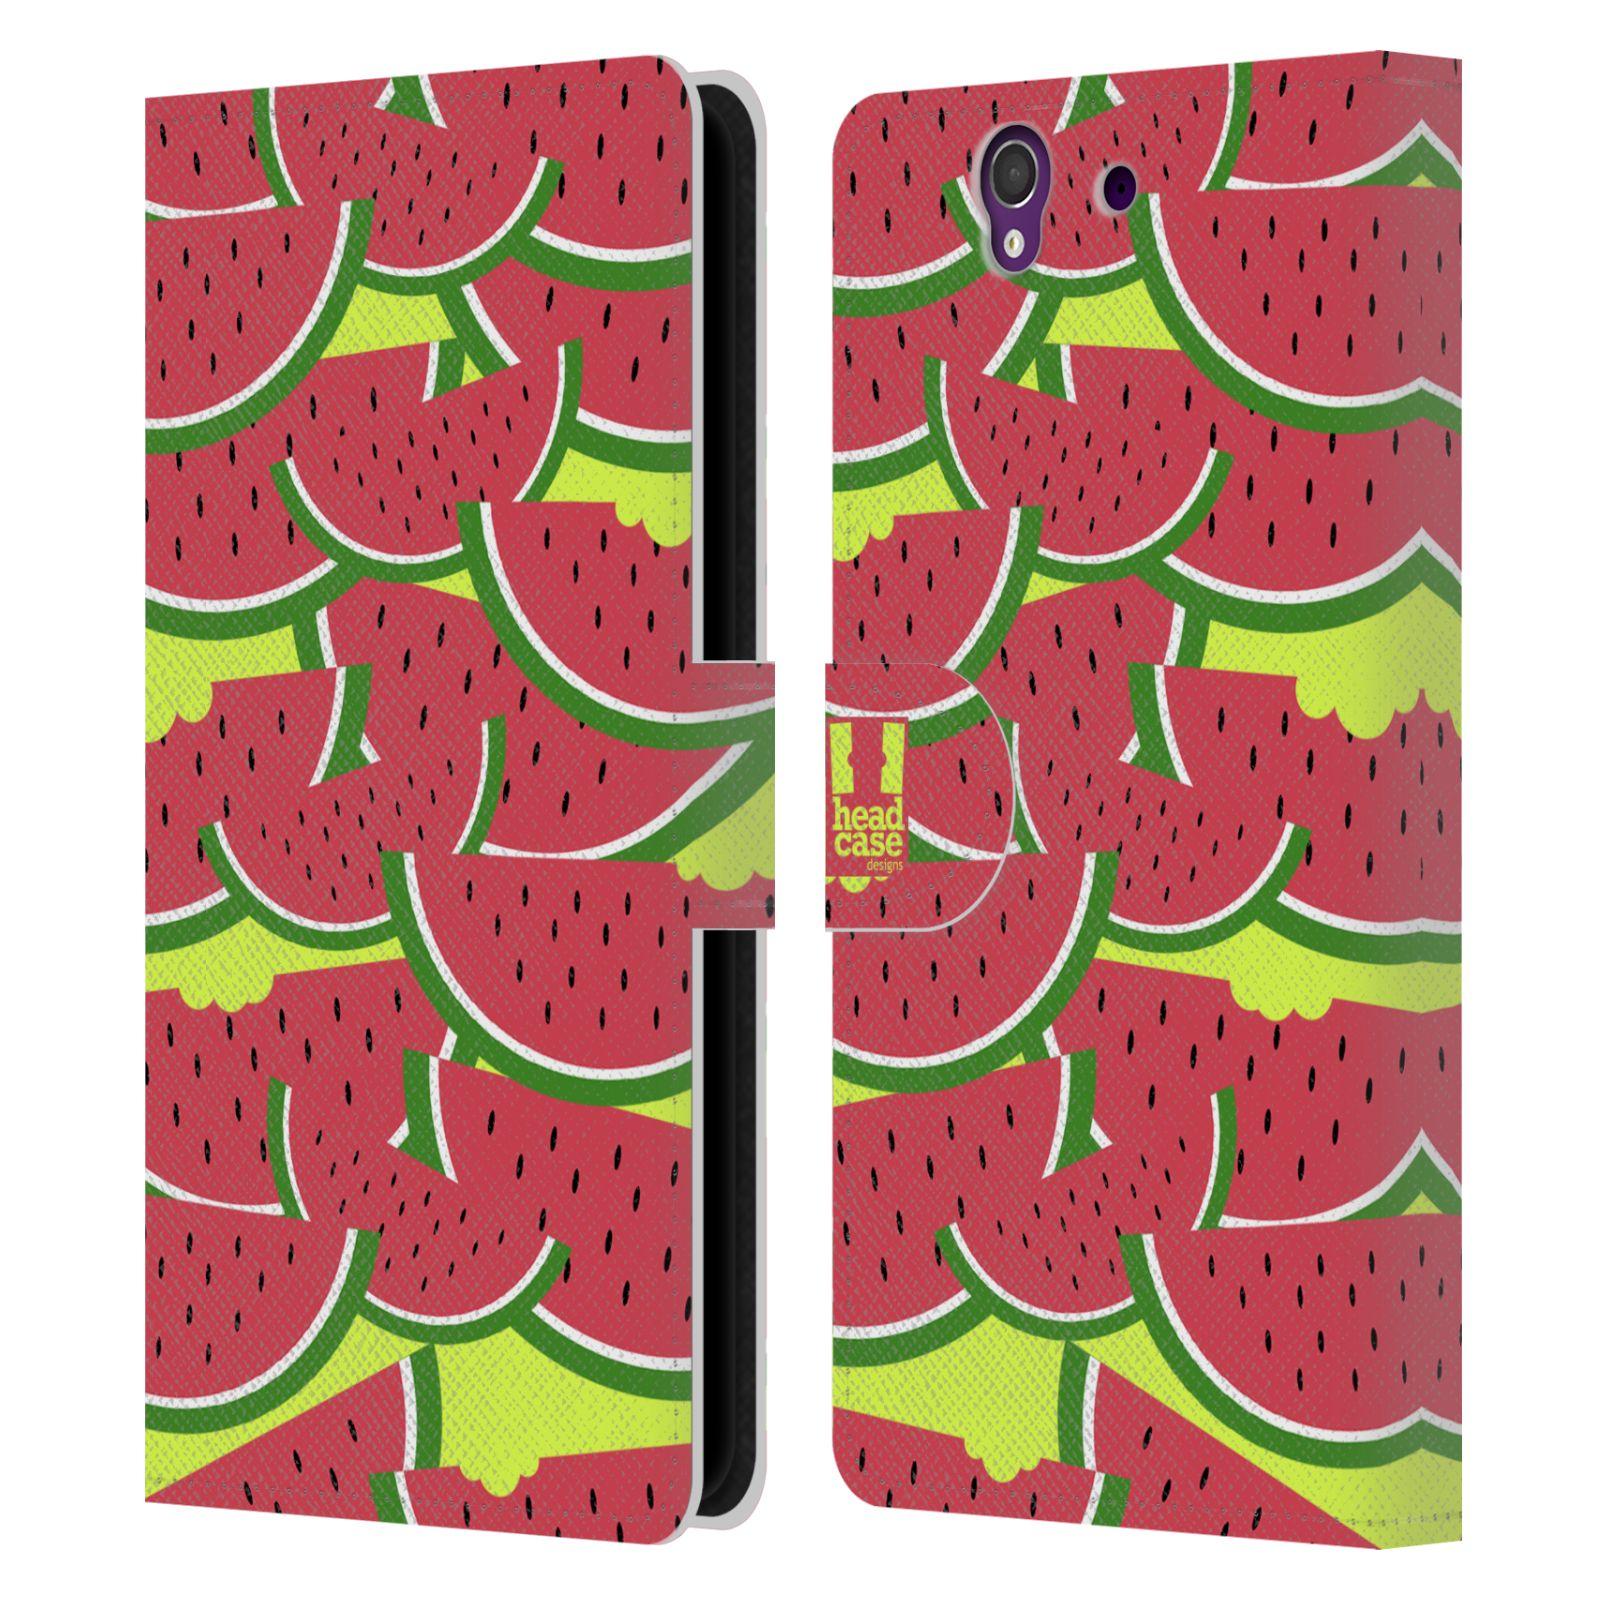 HEAD CASE Flipové pouzdro pro mobil SONY XPERIA Z (C6603) ovocné motivy meloun